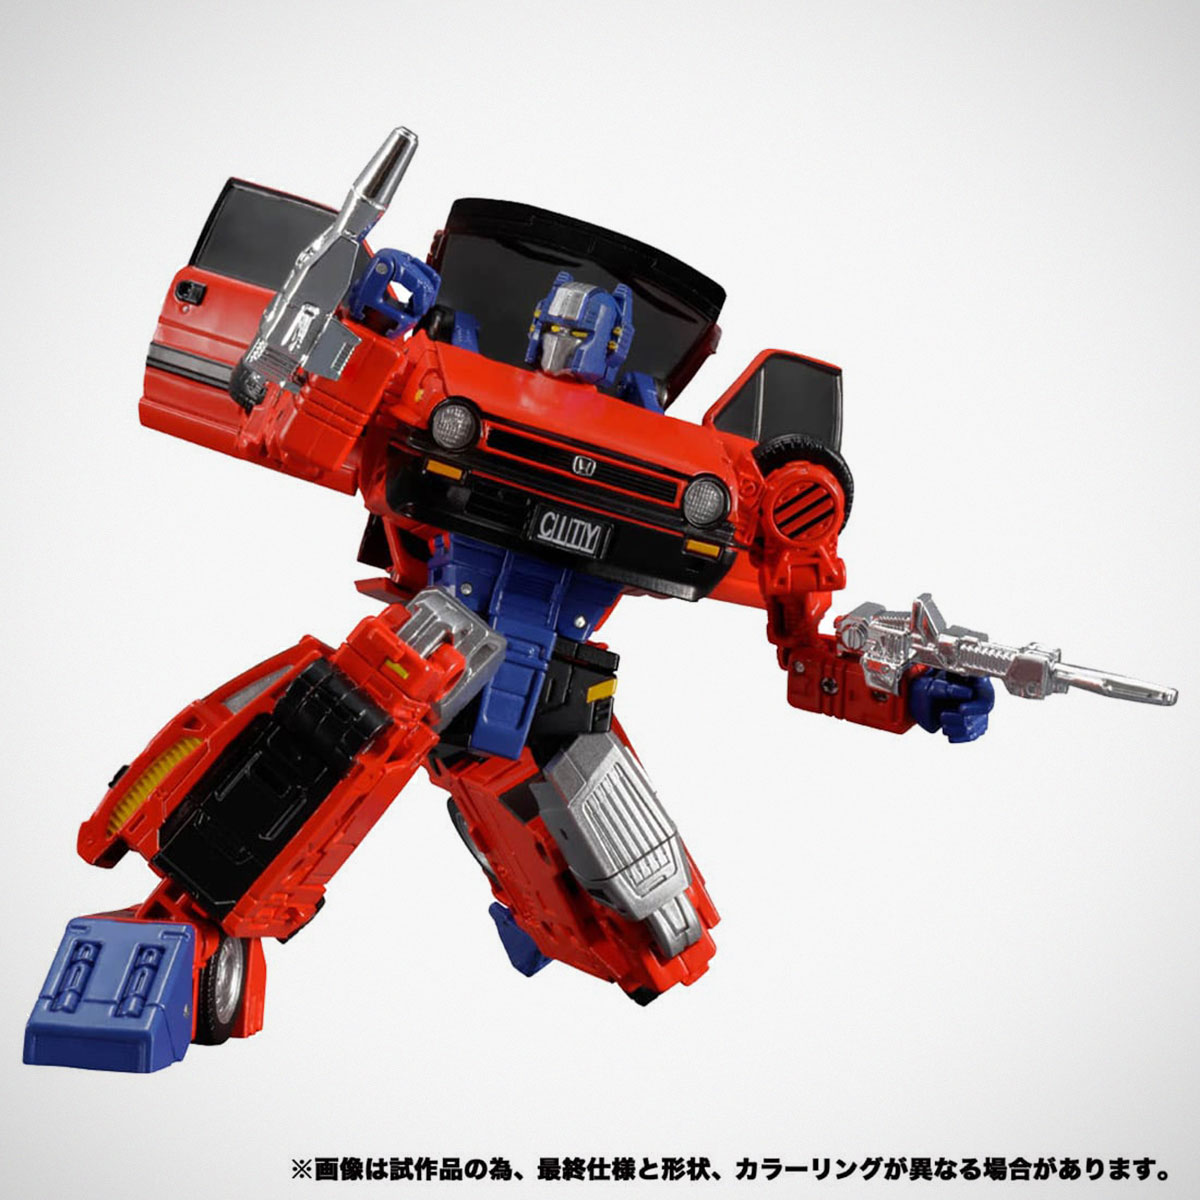 Takara Tomy Transformers MP-54 Reboost